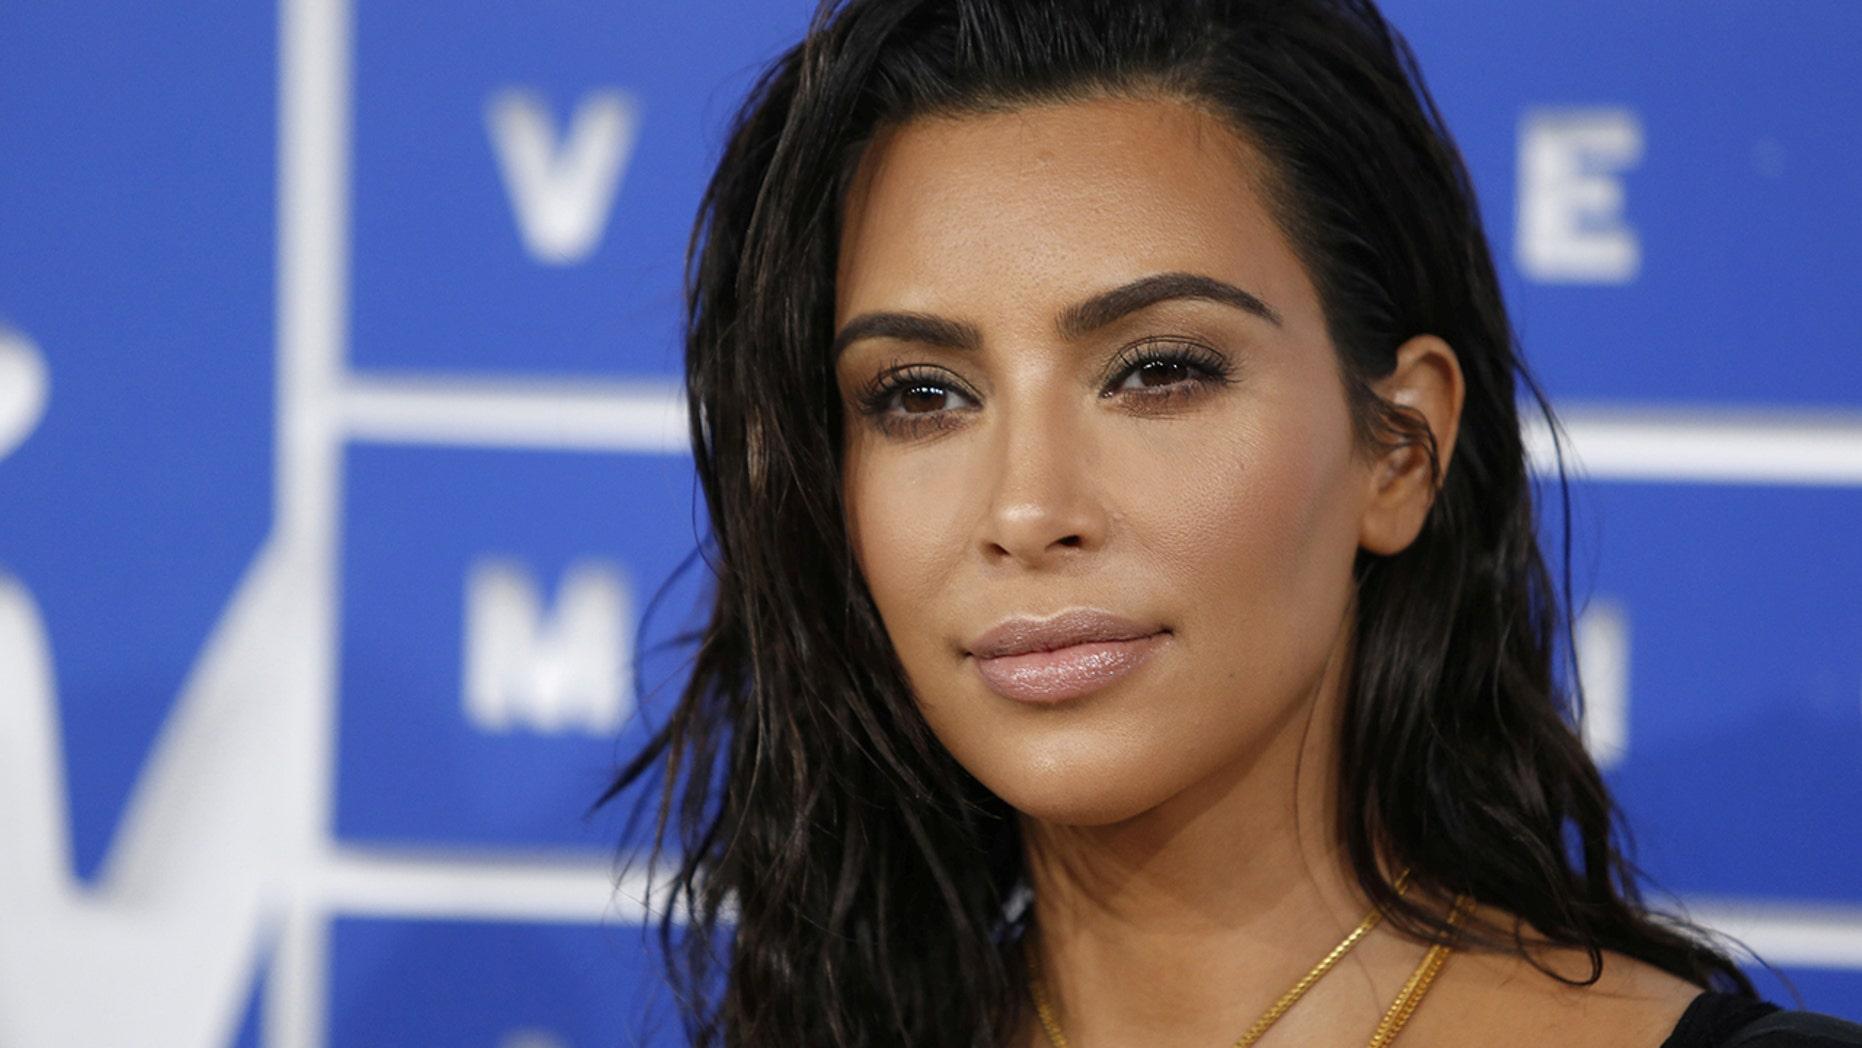 Reality TV star Kim Kardashian's Beverly Hills starter home is for sale